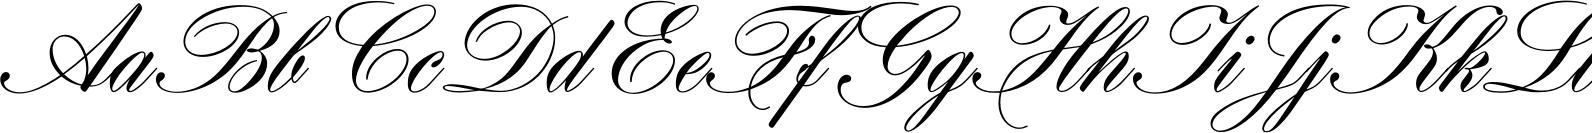 Hogarth Script